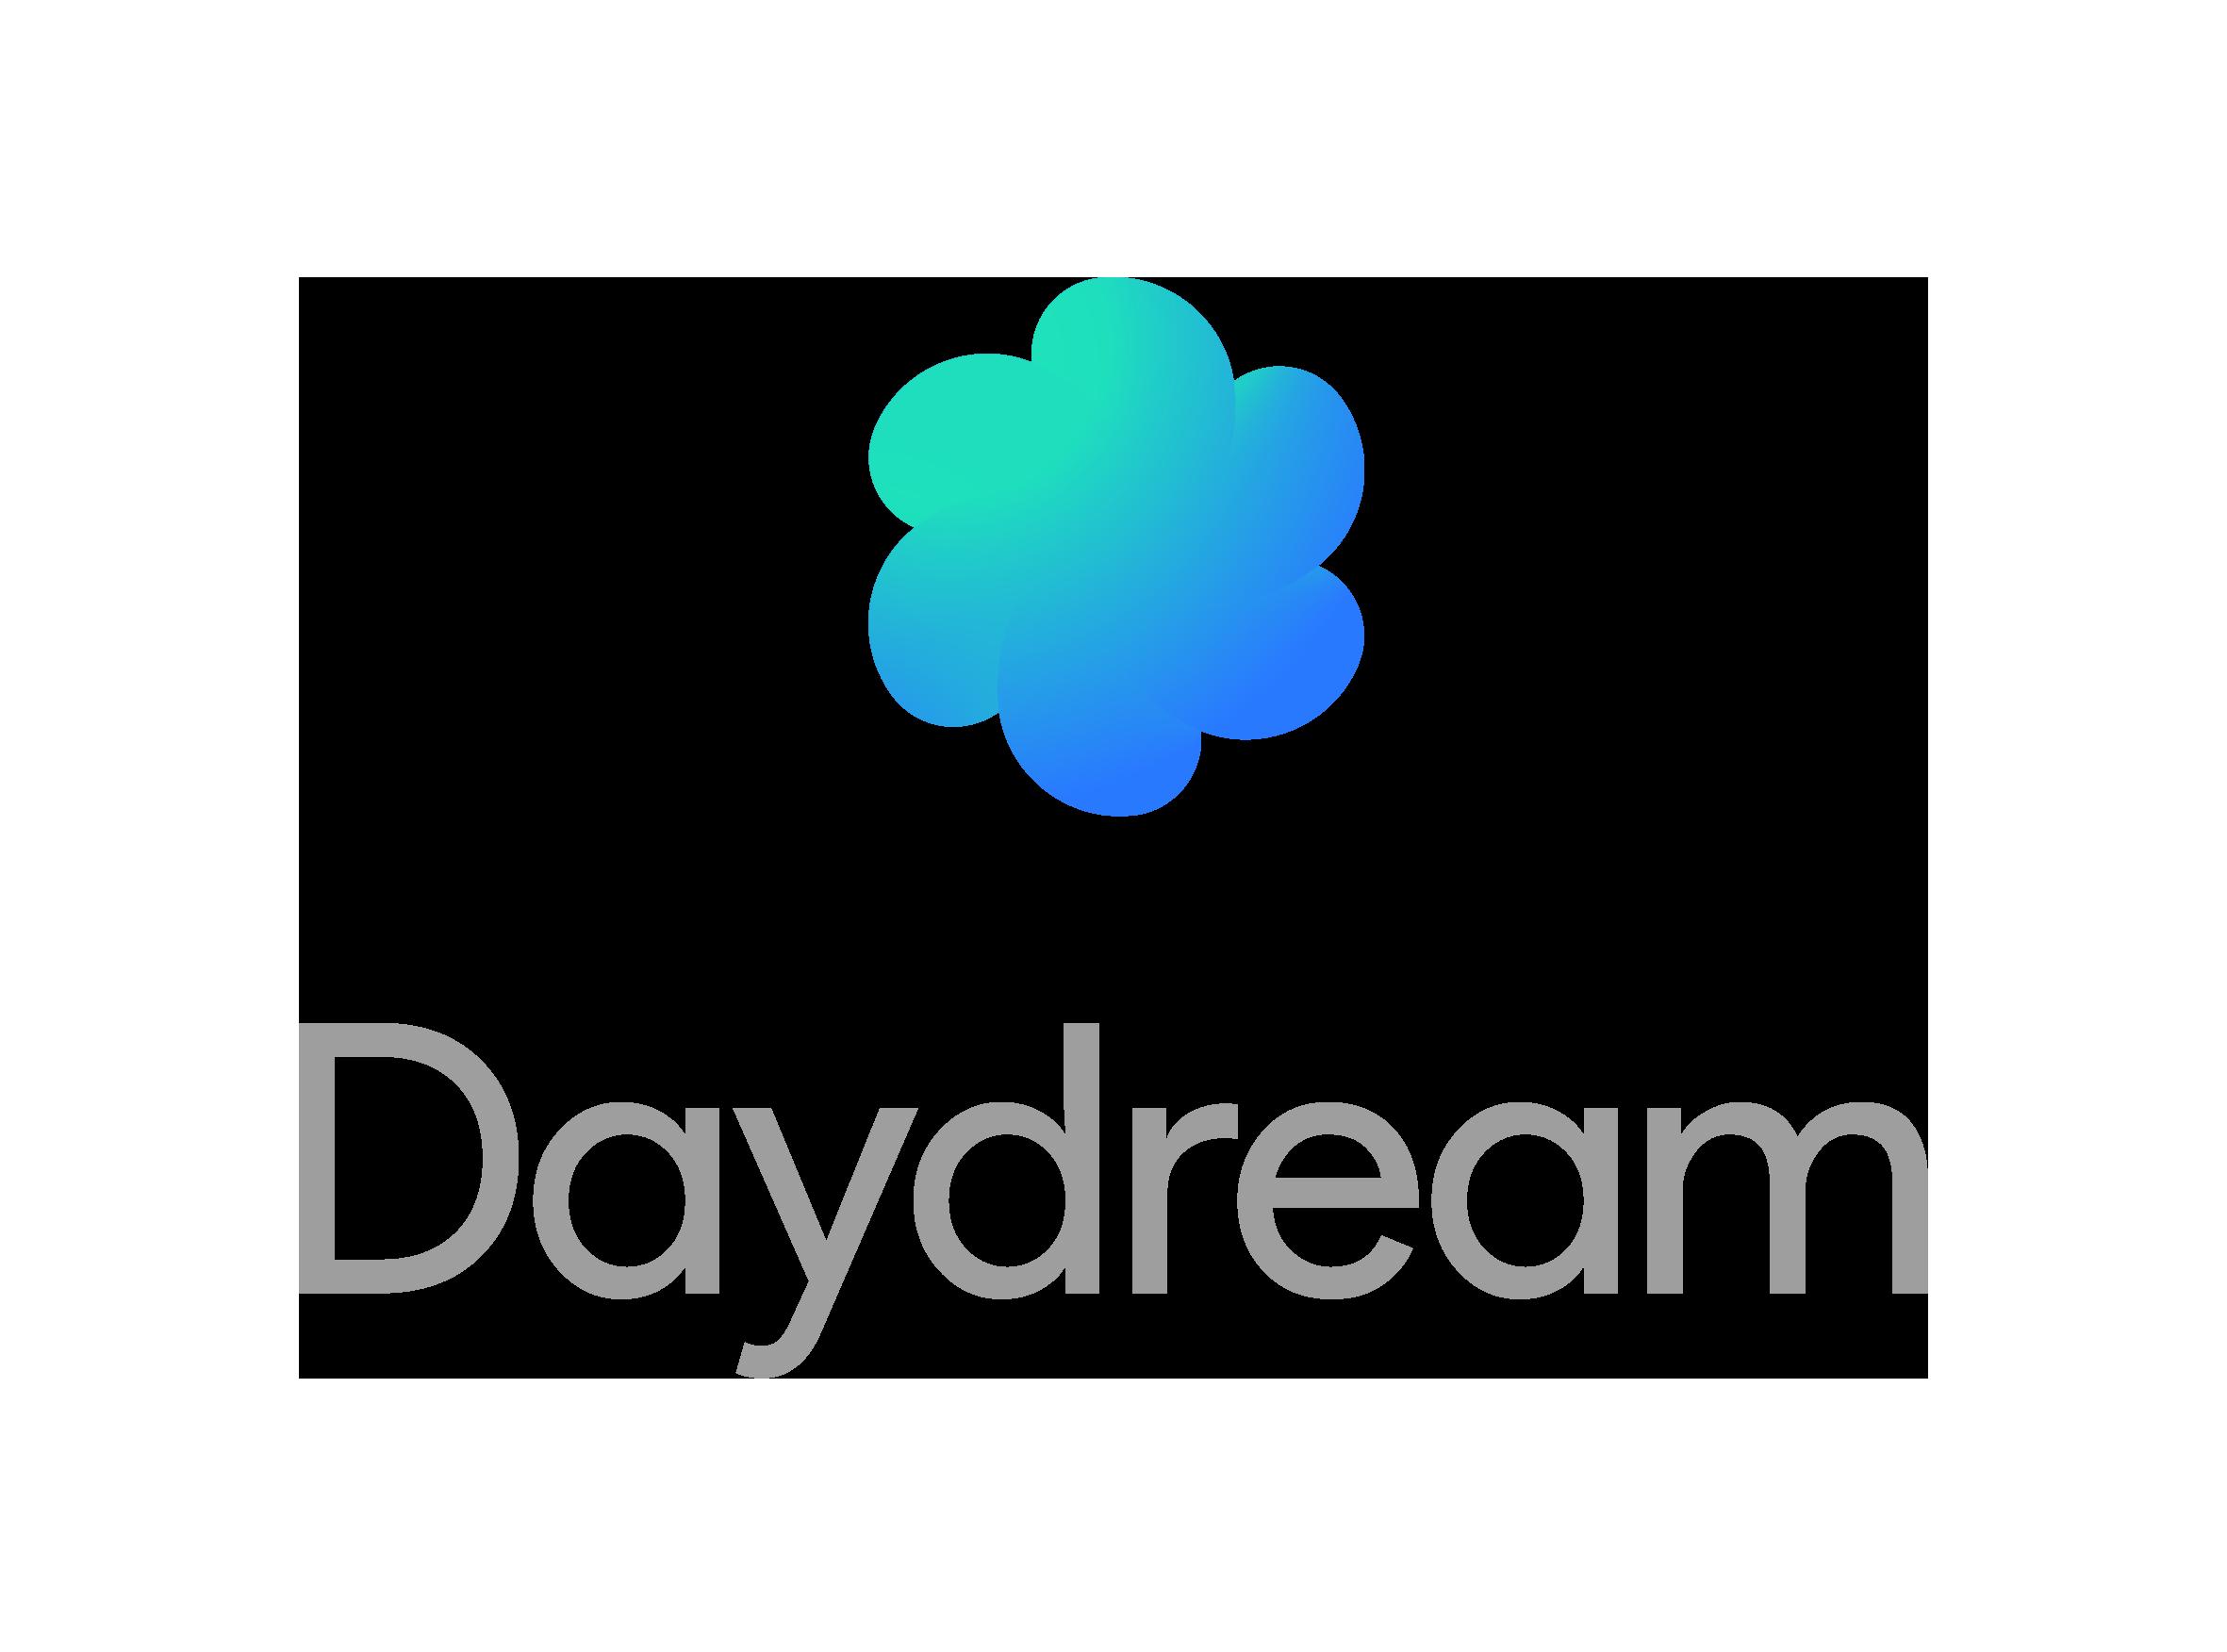 Google_Daydream_Lockup_Secondary_RGB.0